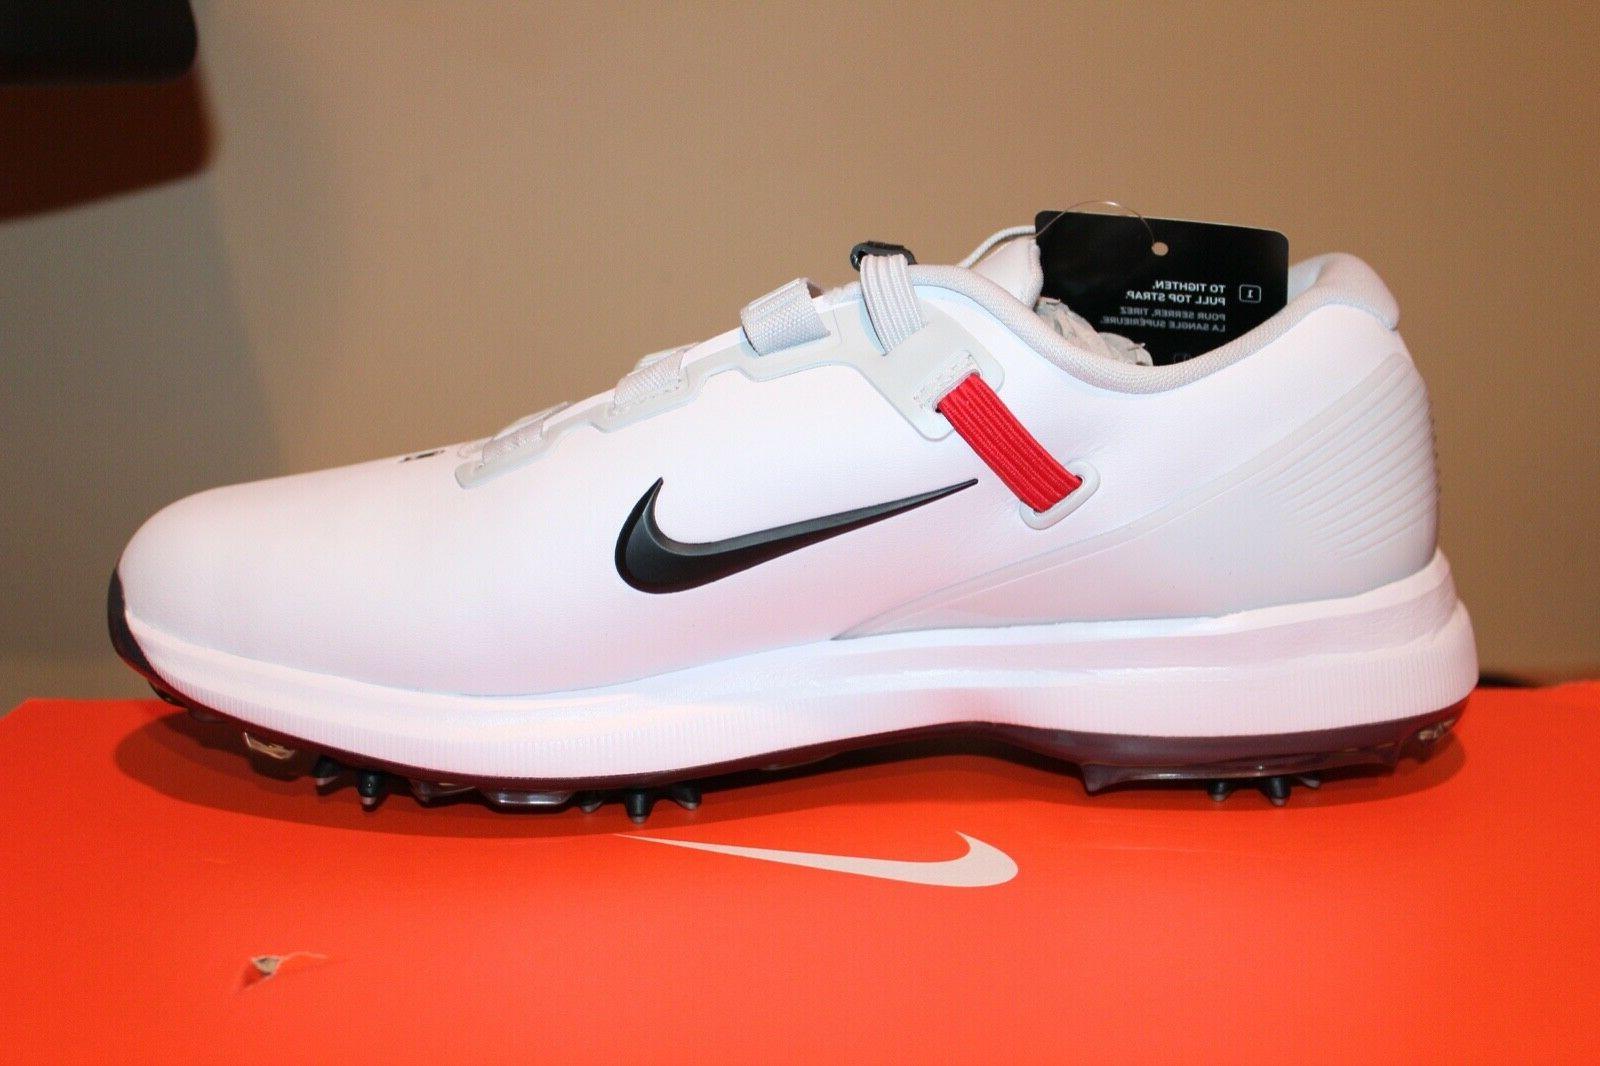 NEW Nike Woods TW71 White : Size 11